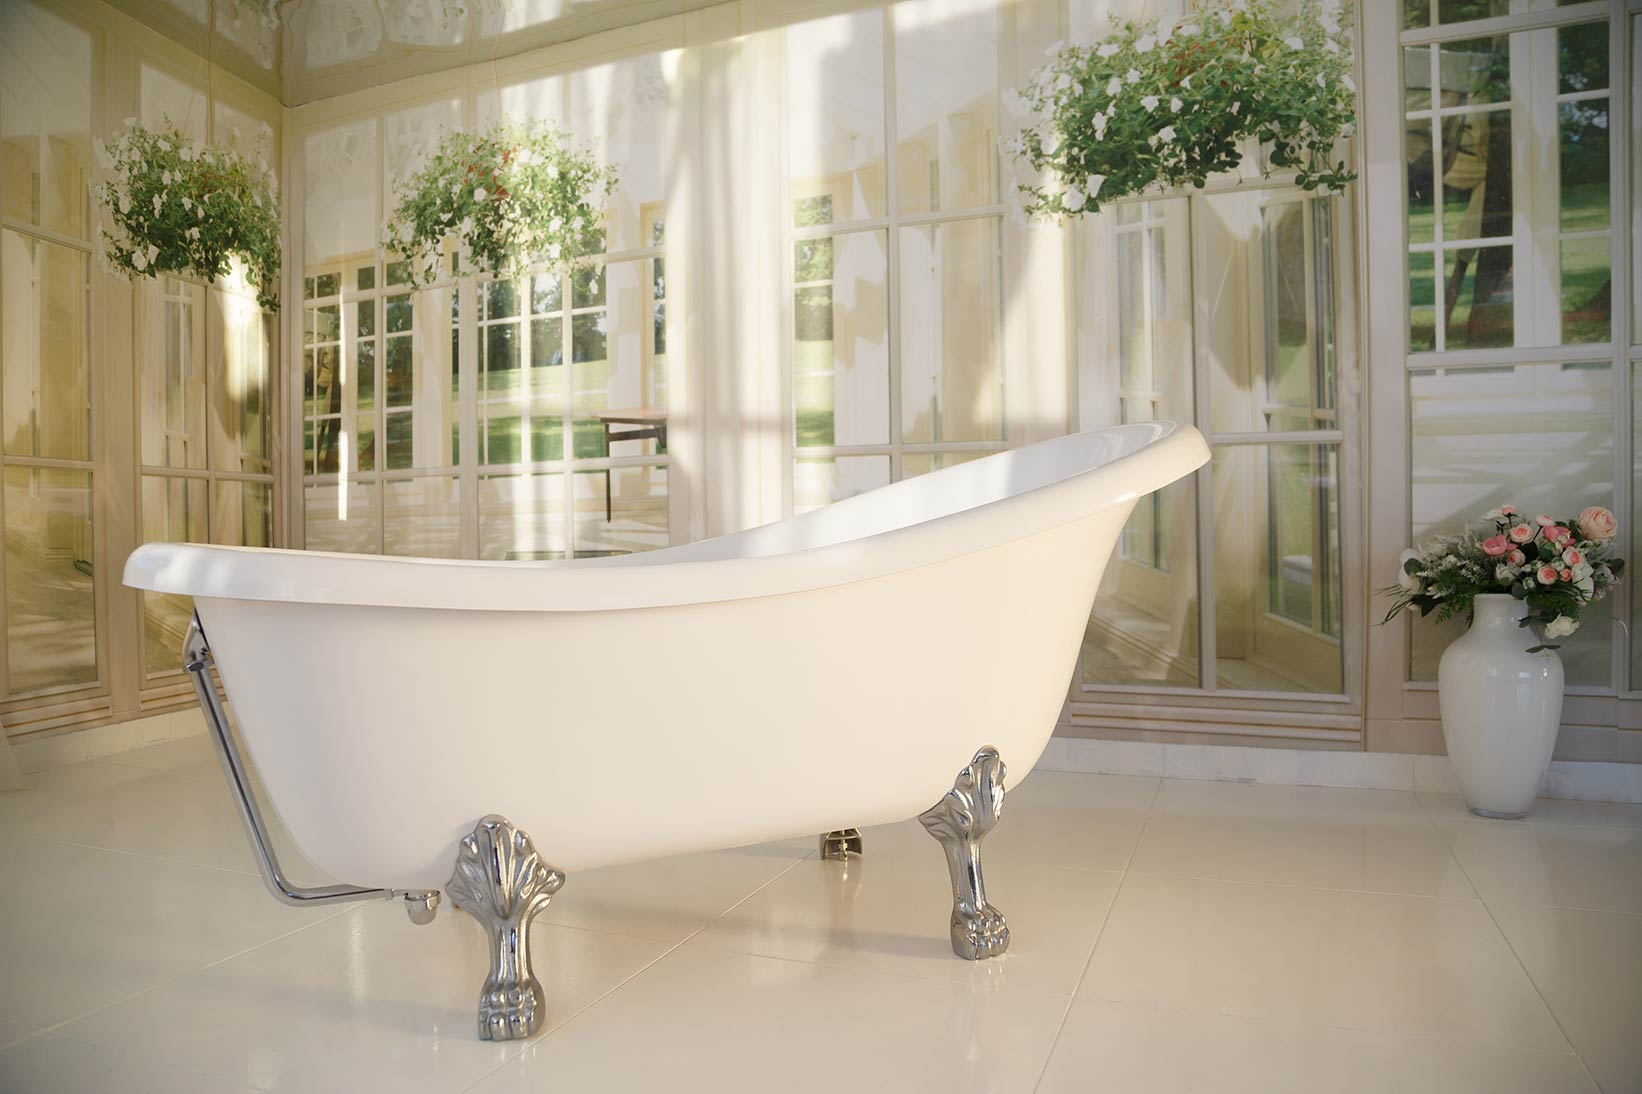 Bathtub Refinishing Jacksonville FL - Tub, Tile, Sink ...